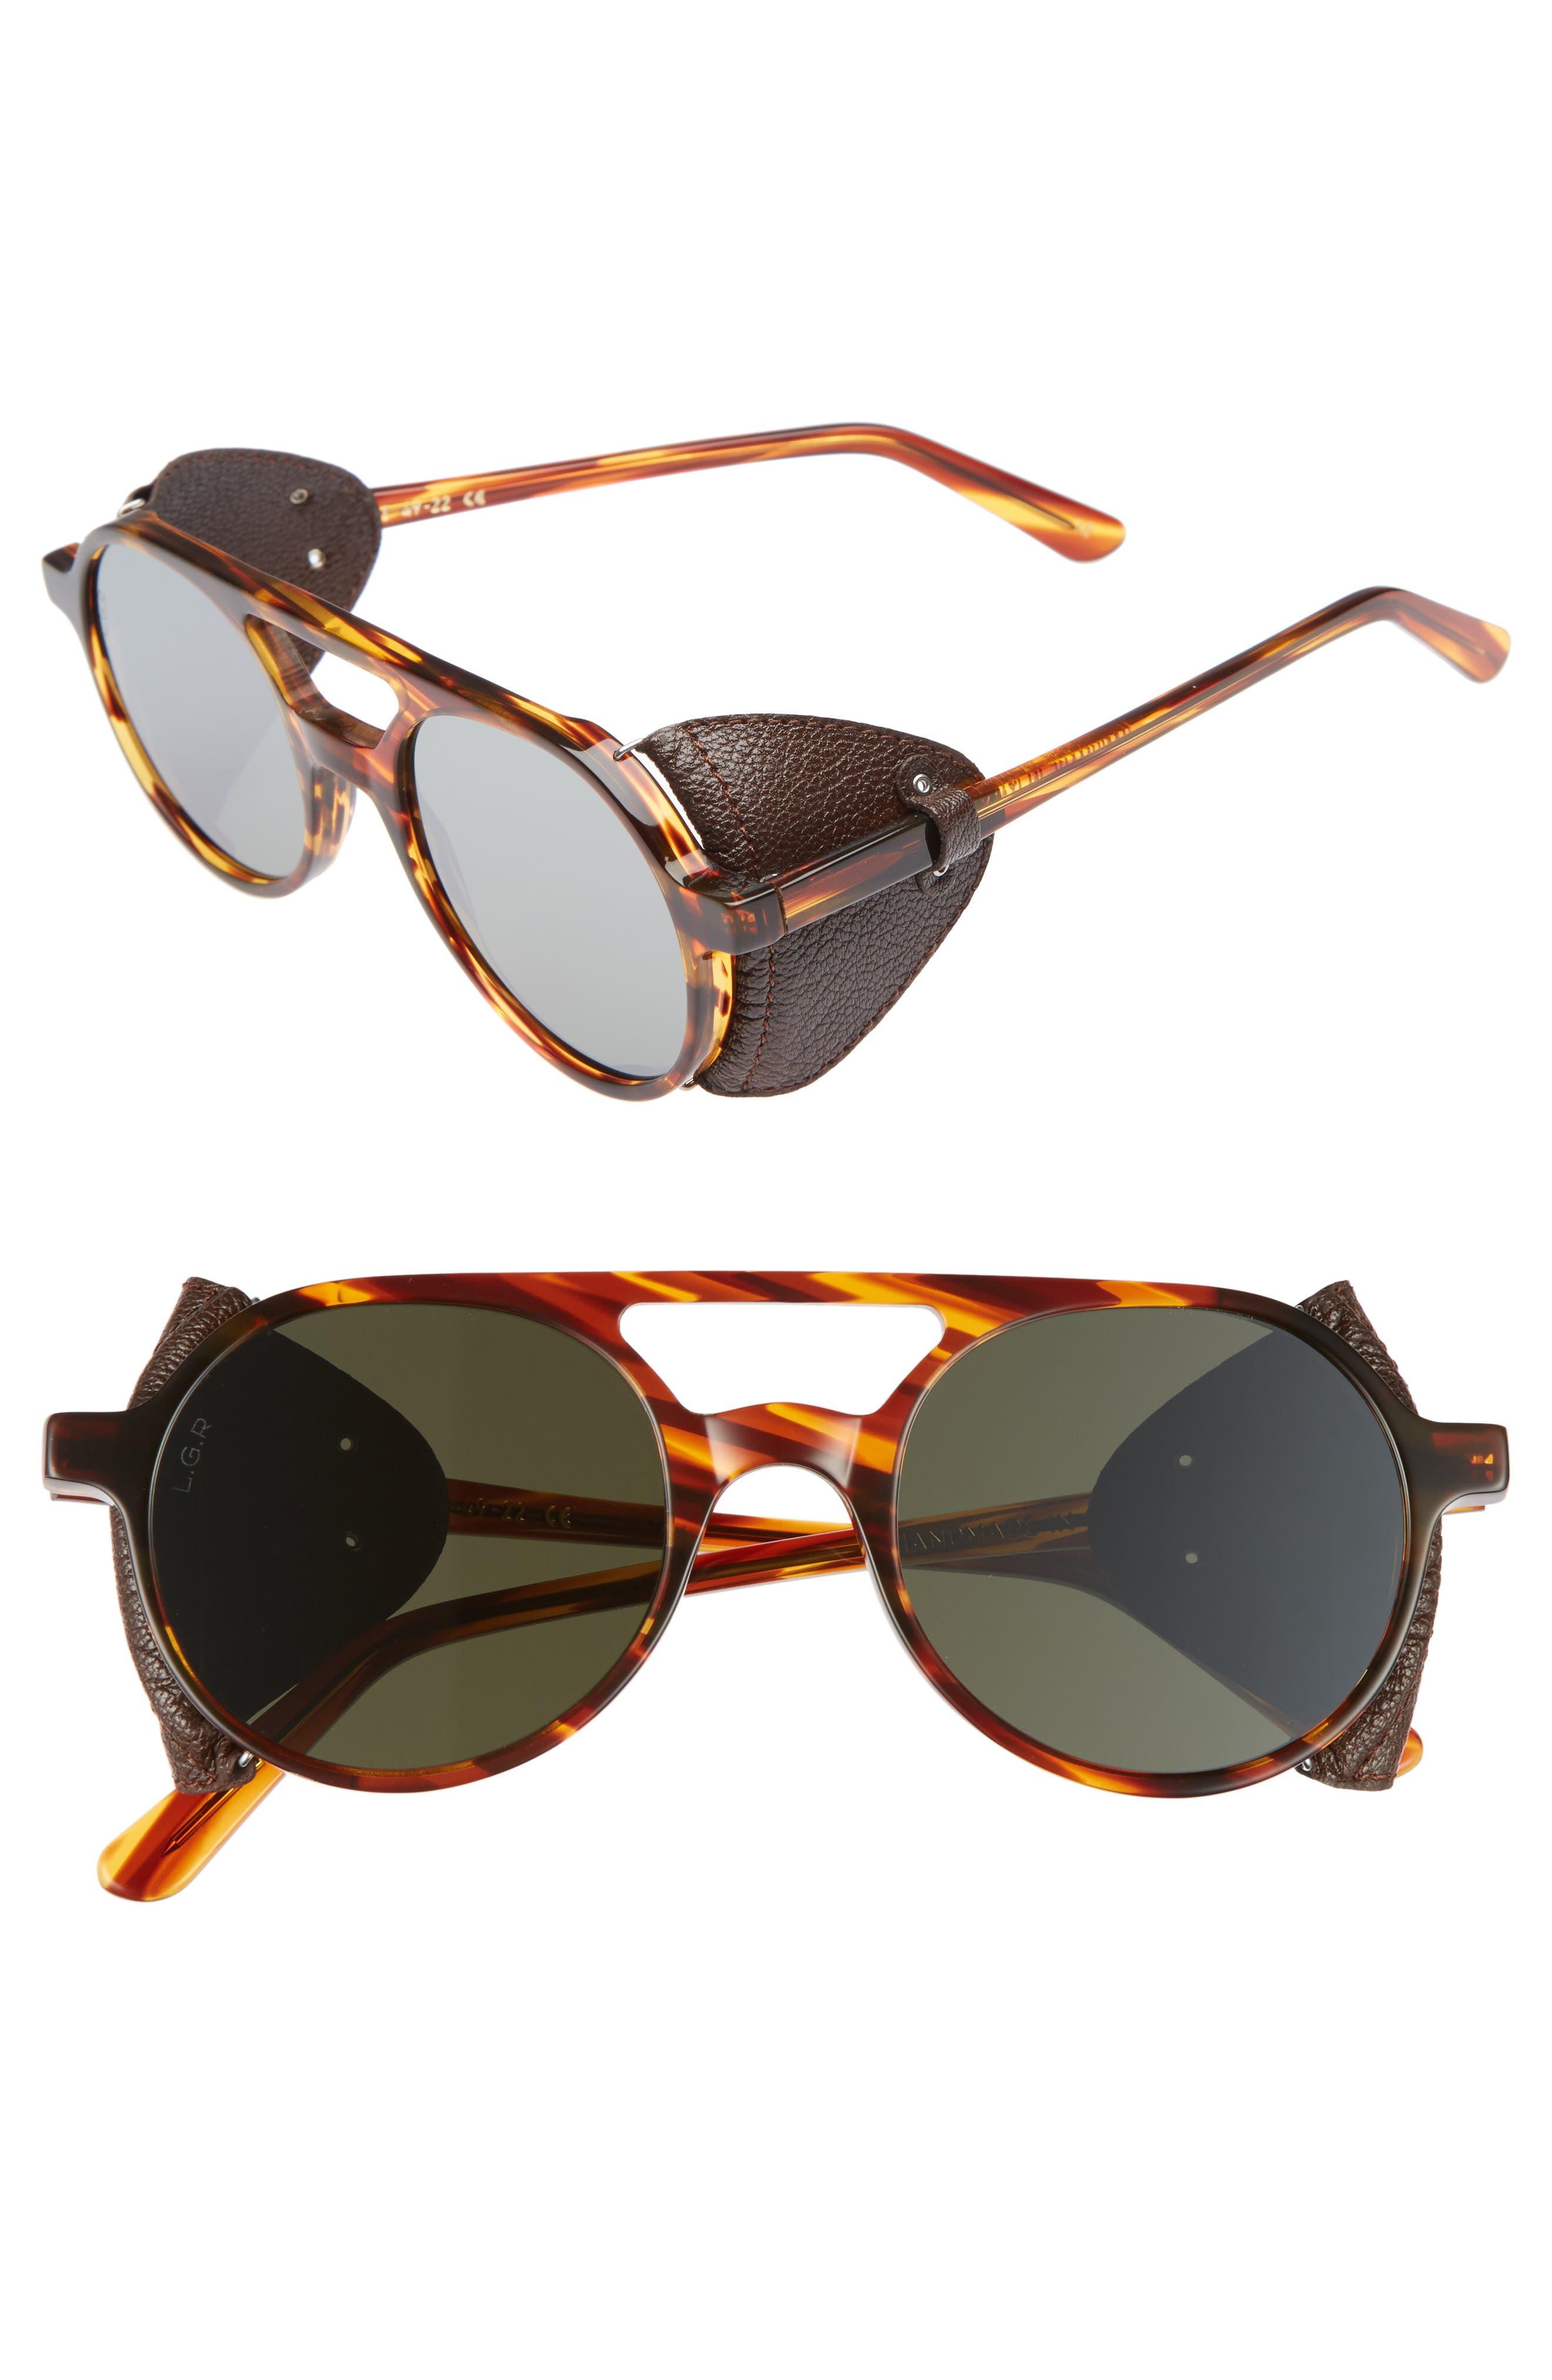 Reunion II 49mm Sunglasses,                         Main,                         color, 200